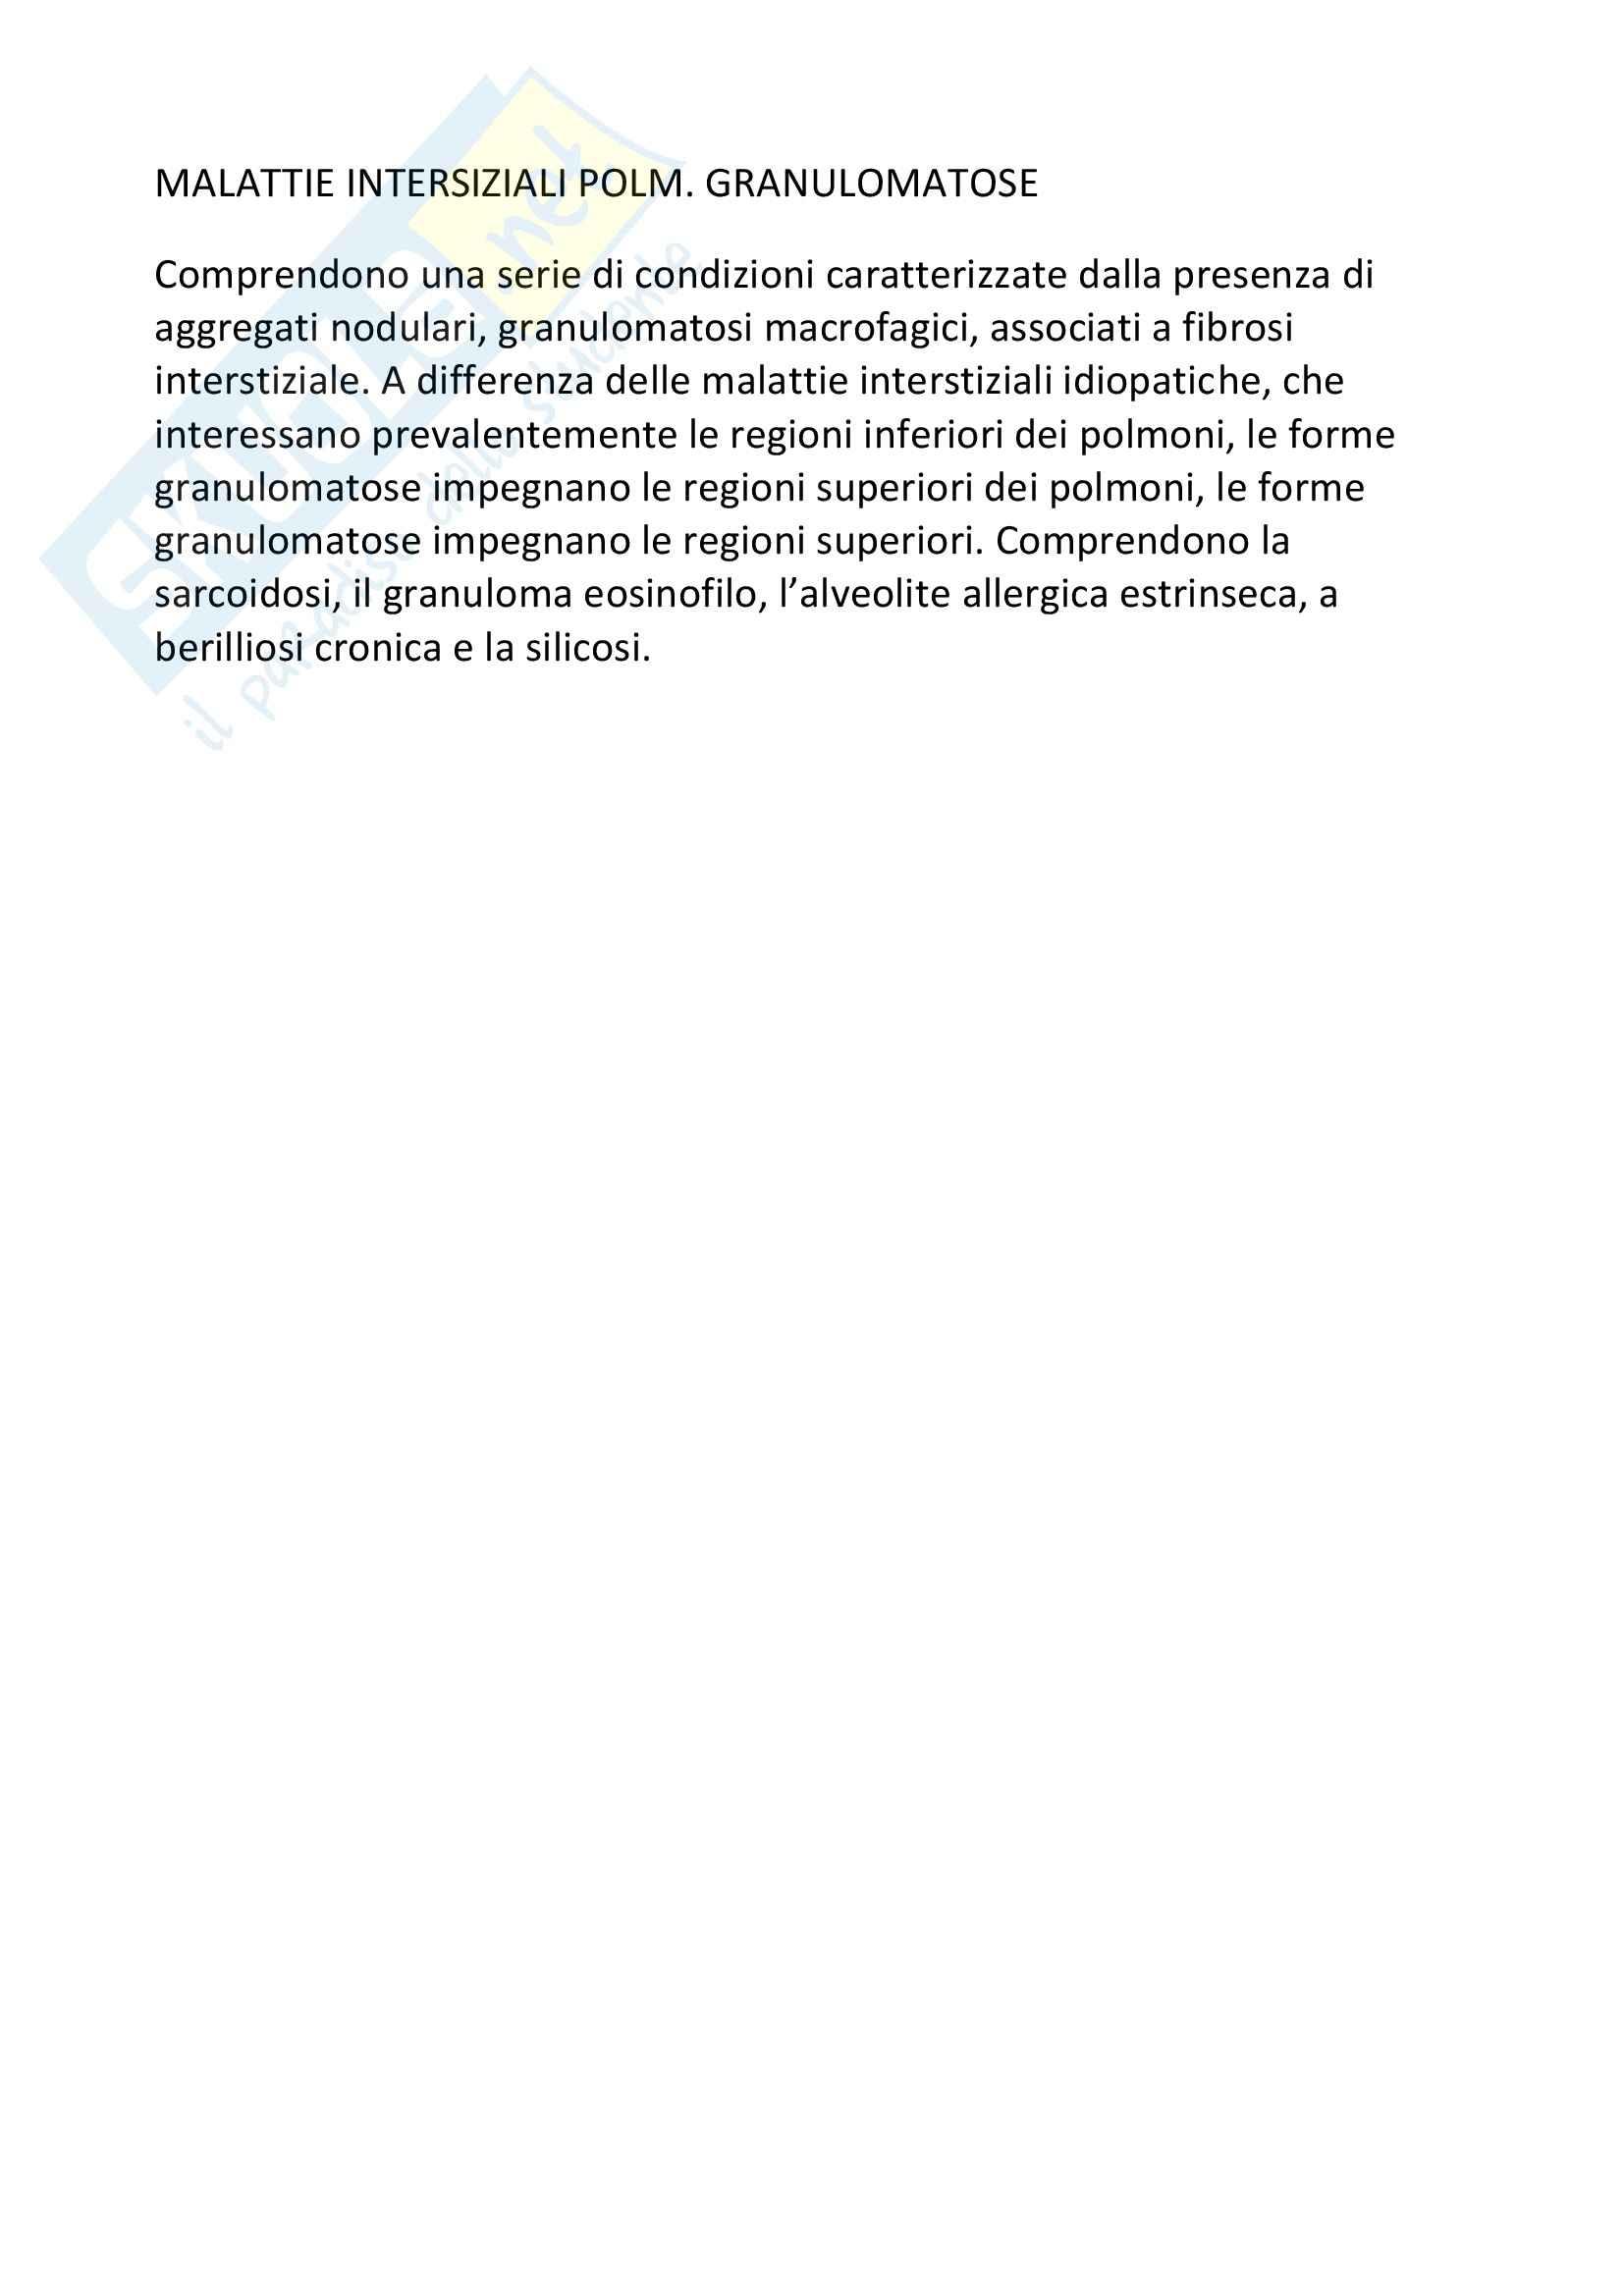 Anatomia patologica - Malattie interstiziali polmonari granulomatose